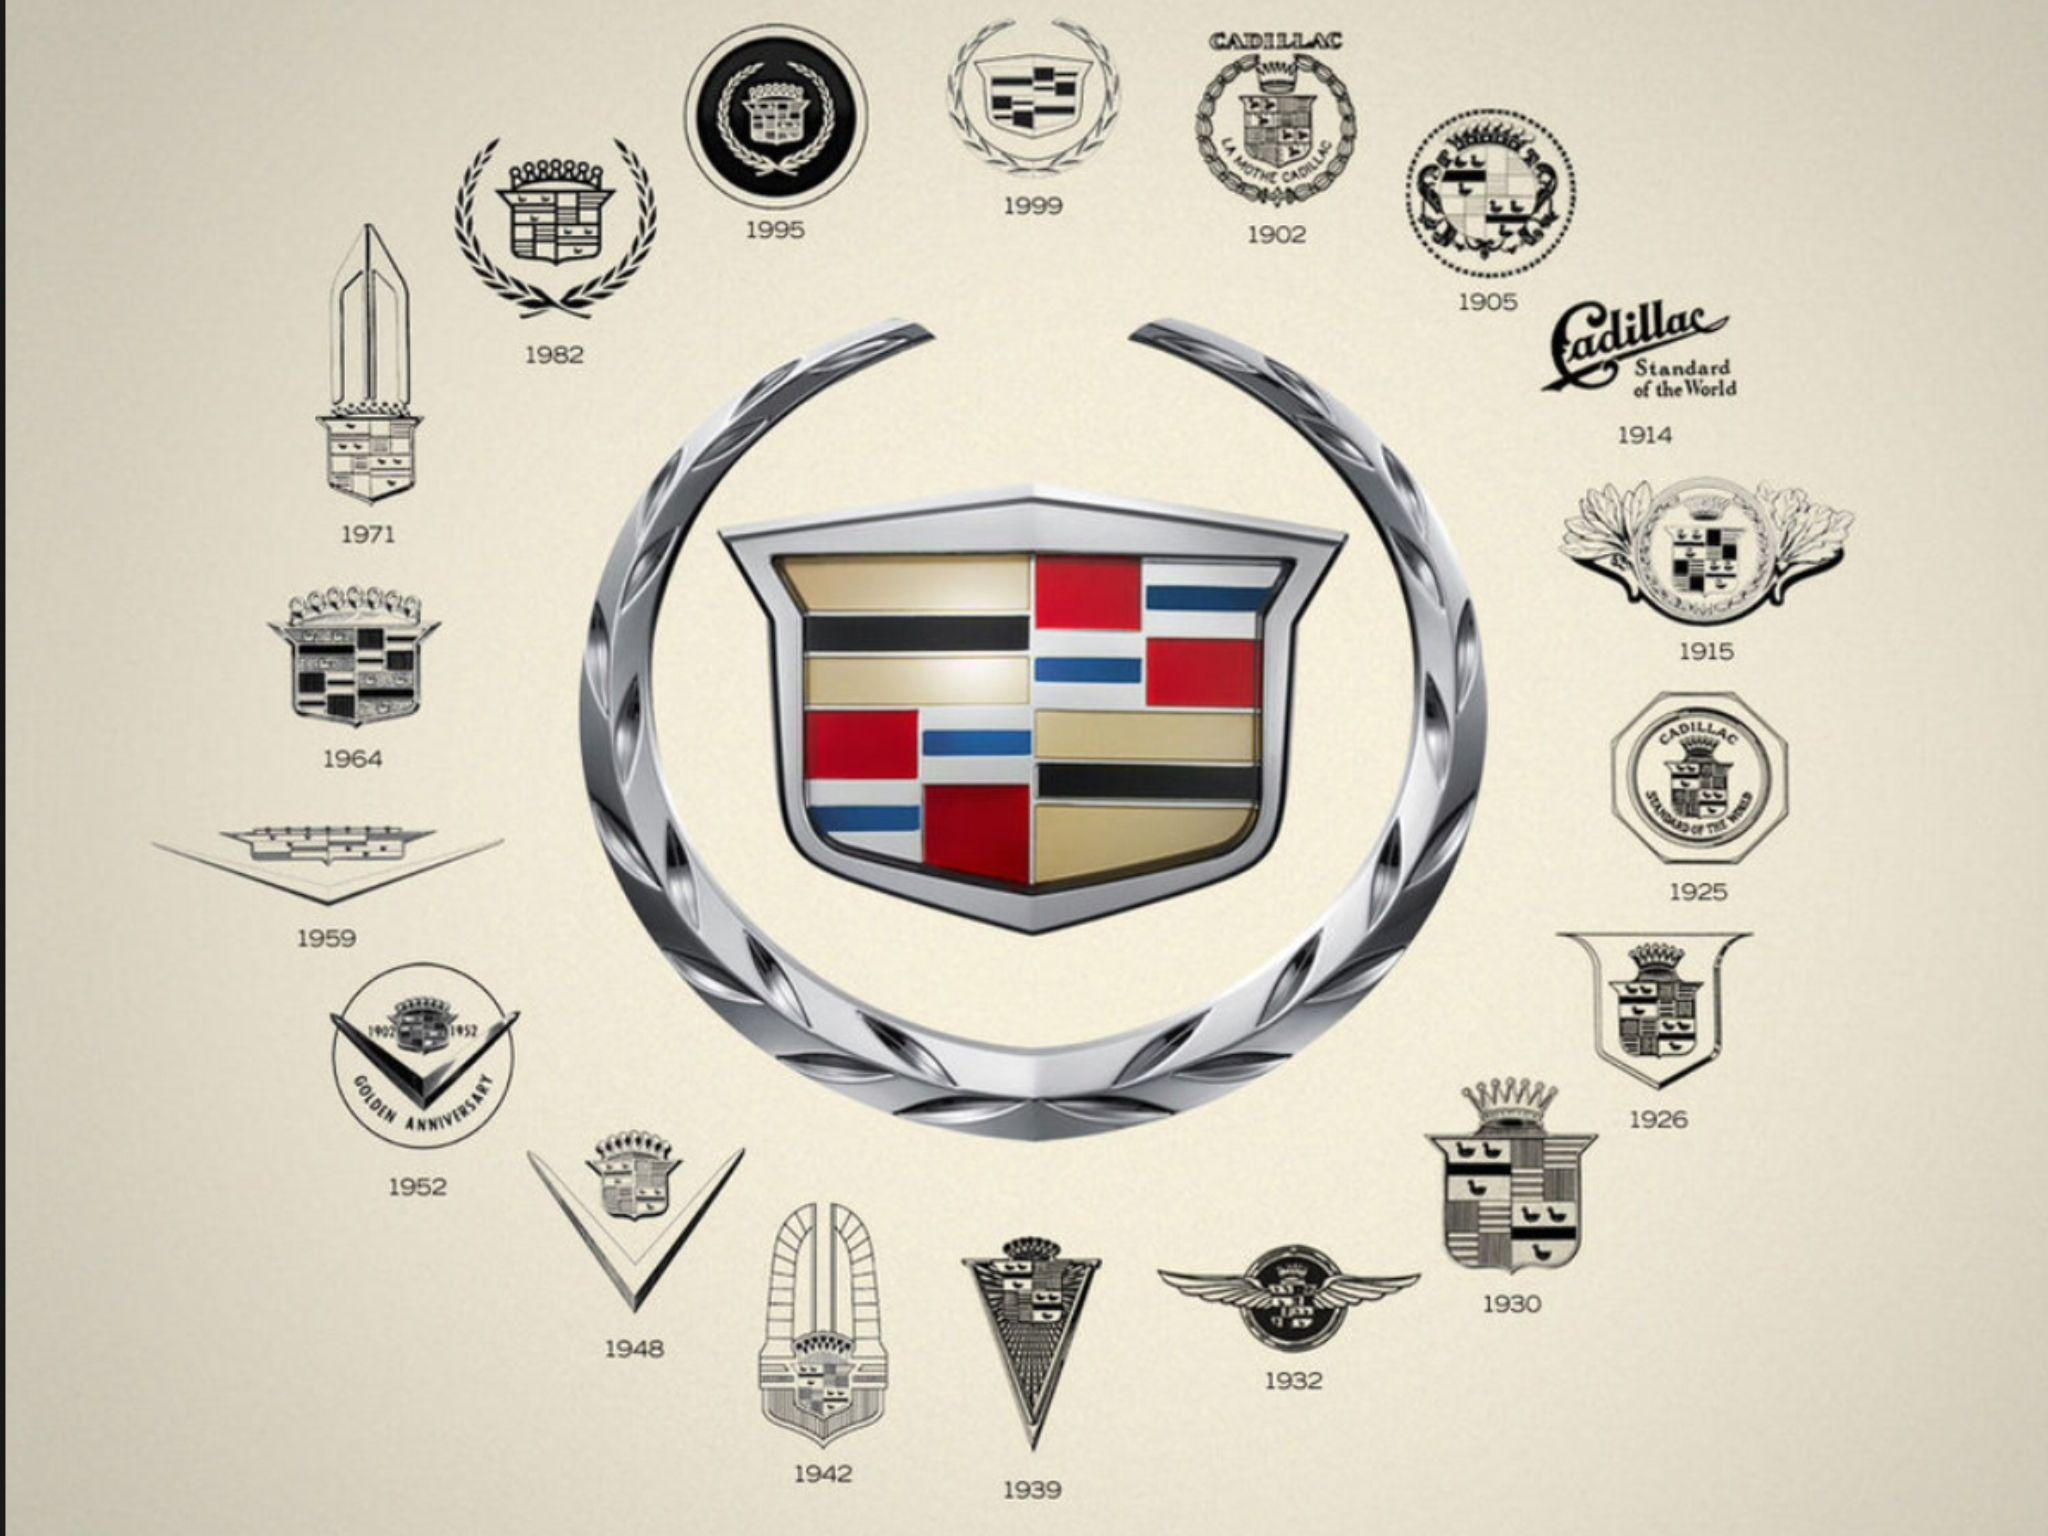 Cadillac emblems thru the years | Cars | Car brands logos ...